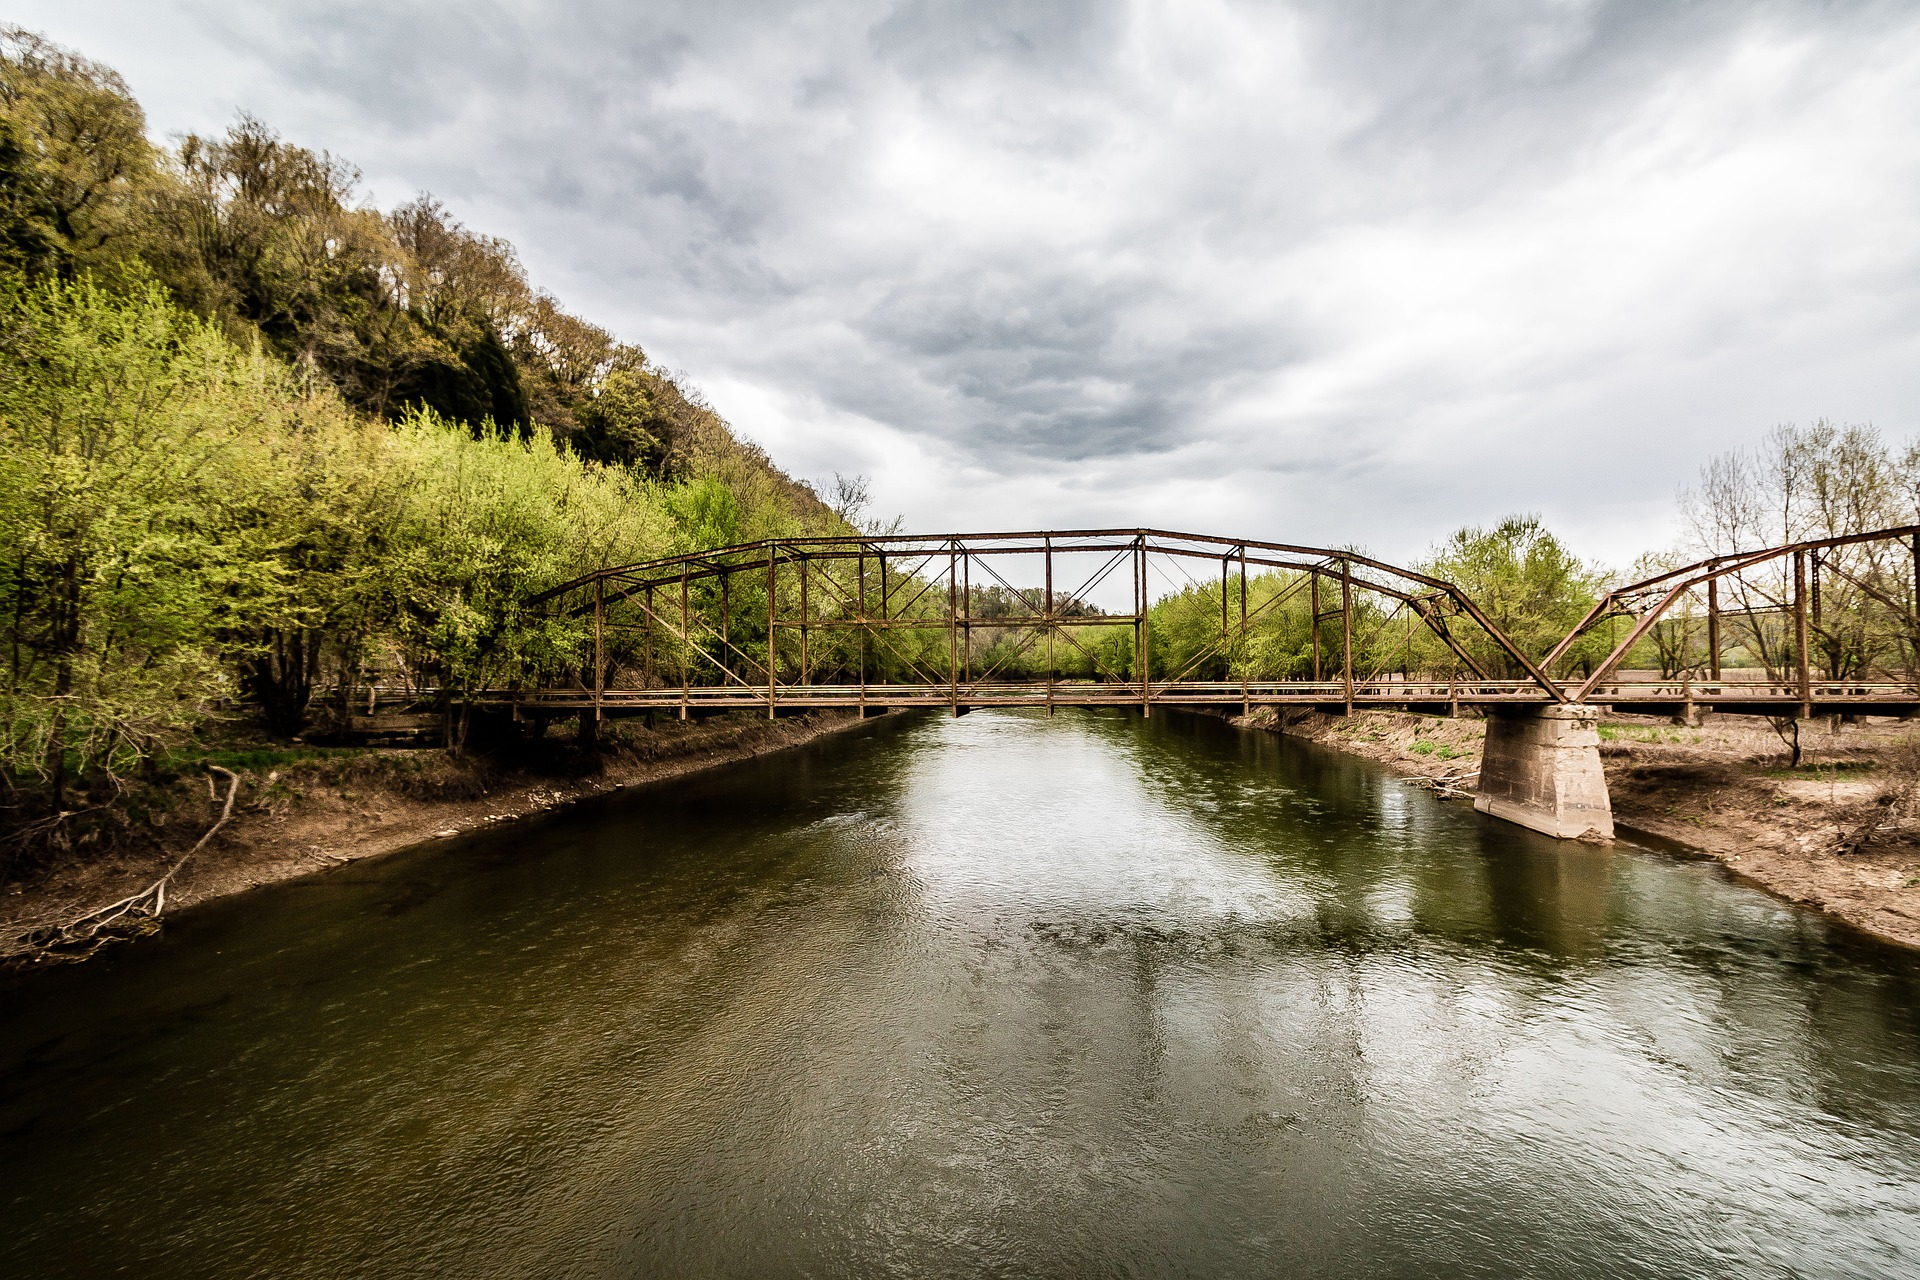 Midwest river flowing under railway bridge